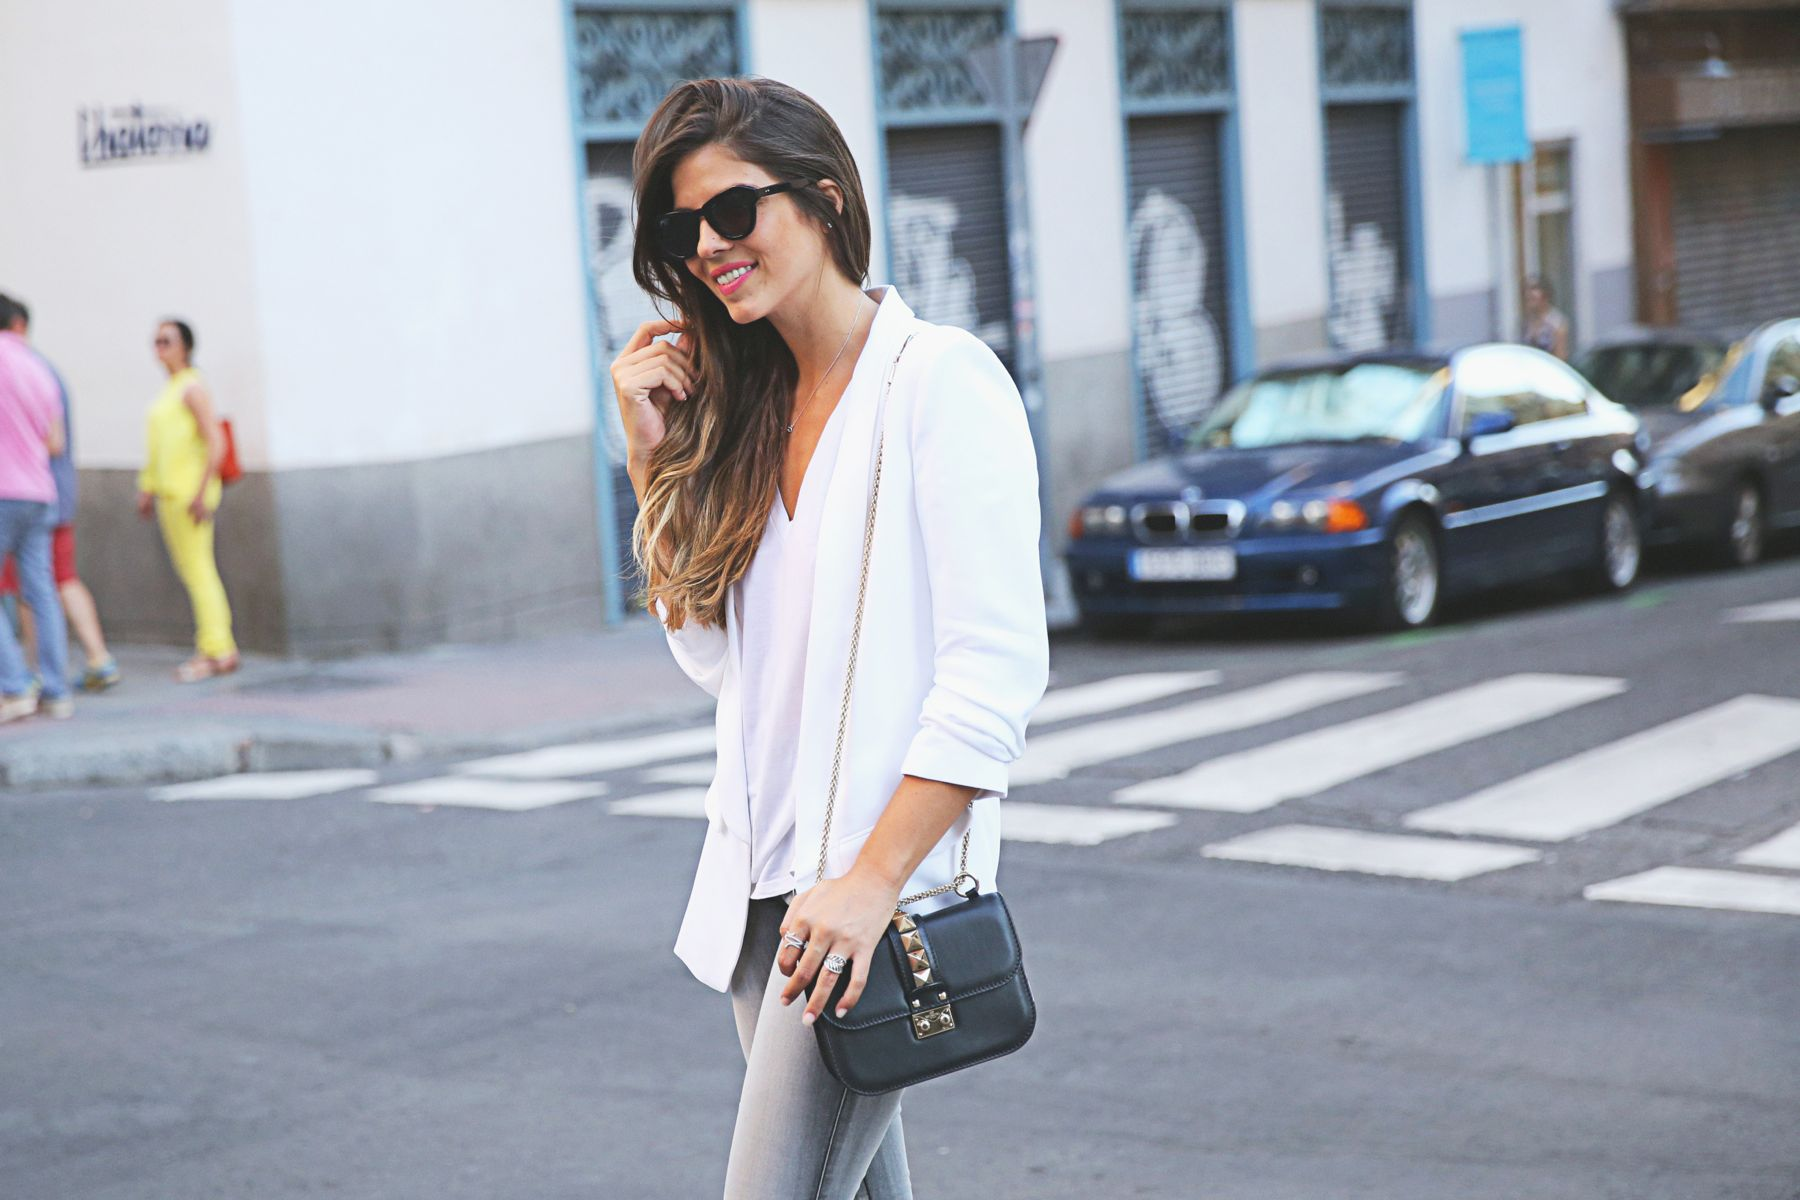 trendy-taste-look-outfit-street-style-ootd-blog-blogger-fashion-spain-moda-españa-SS15-verano2015-tendencias-trends-zara-buylevard-valentino-jessica-simpson-skinny-jeans-grey-white-blazer-americana-blanca-vaqueros-pitillo-sandalias-sandals-etnicas-7